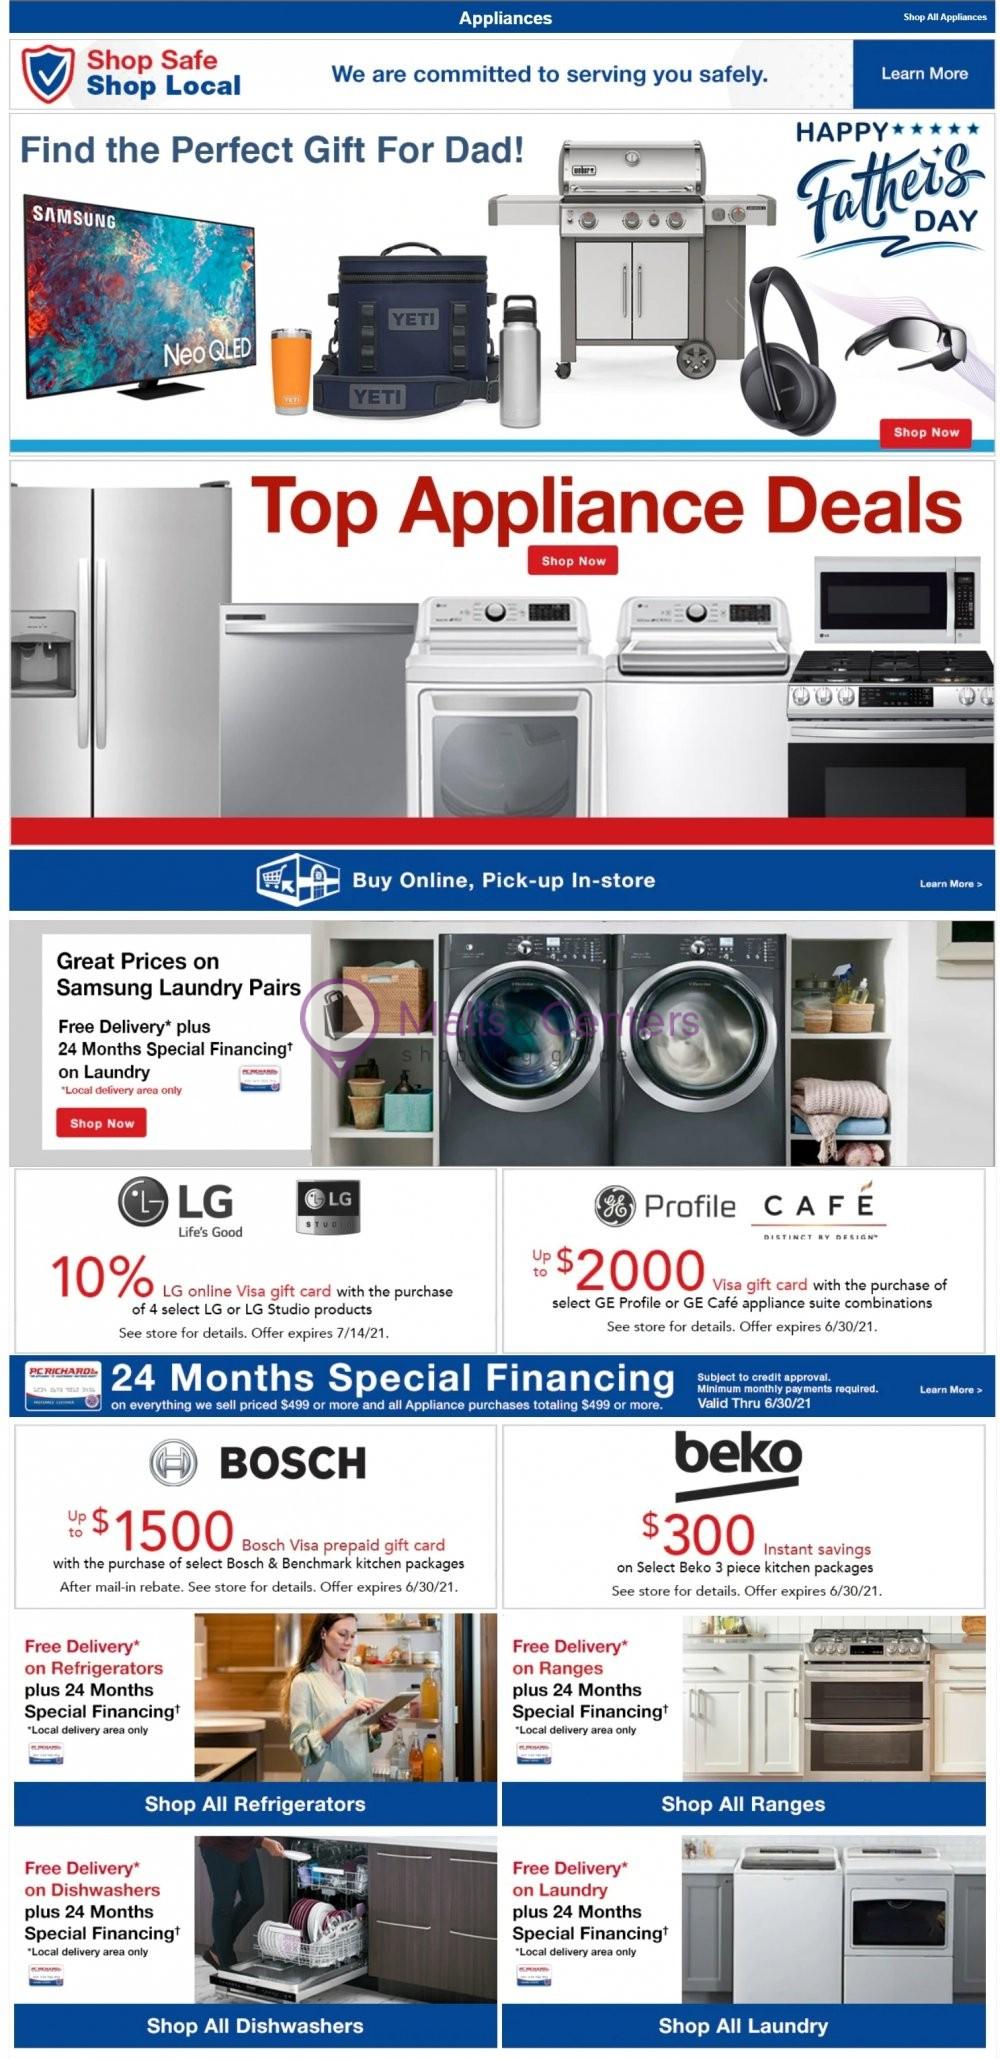 weekly ads P.C. Richard & Son - page 1 - mallscenters.com